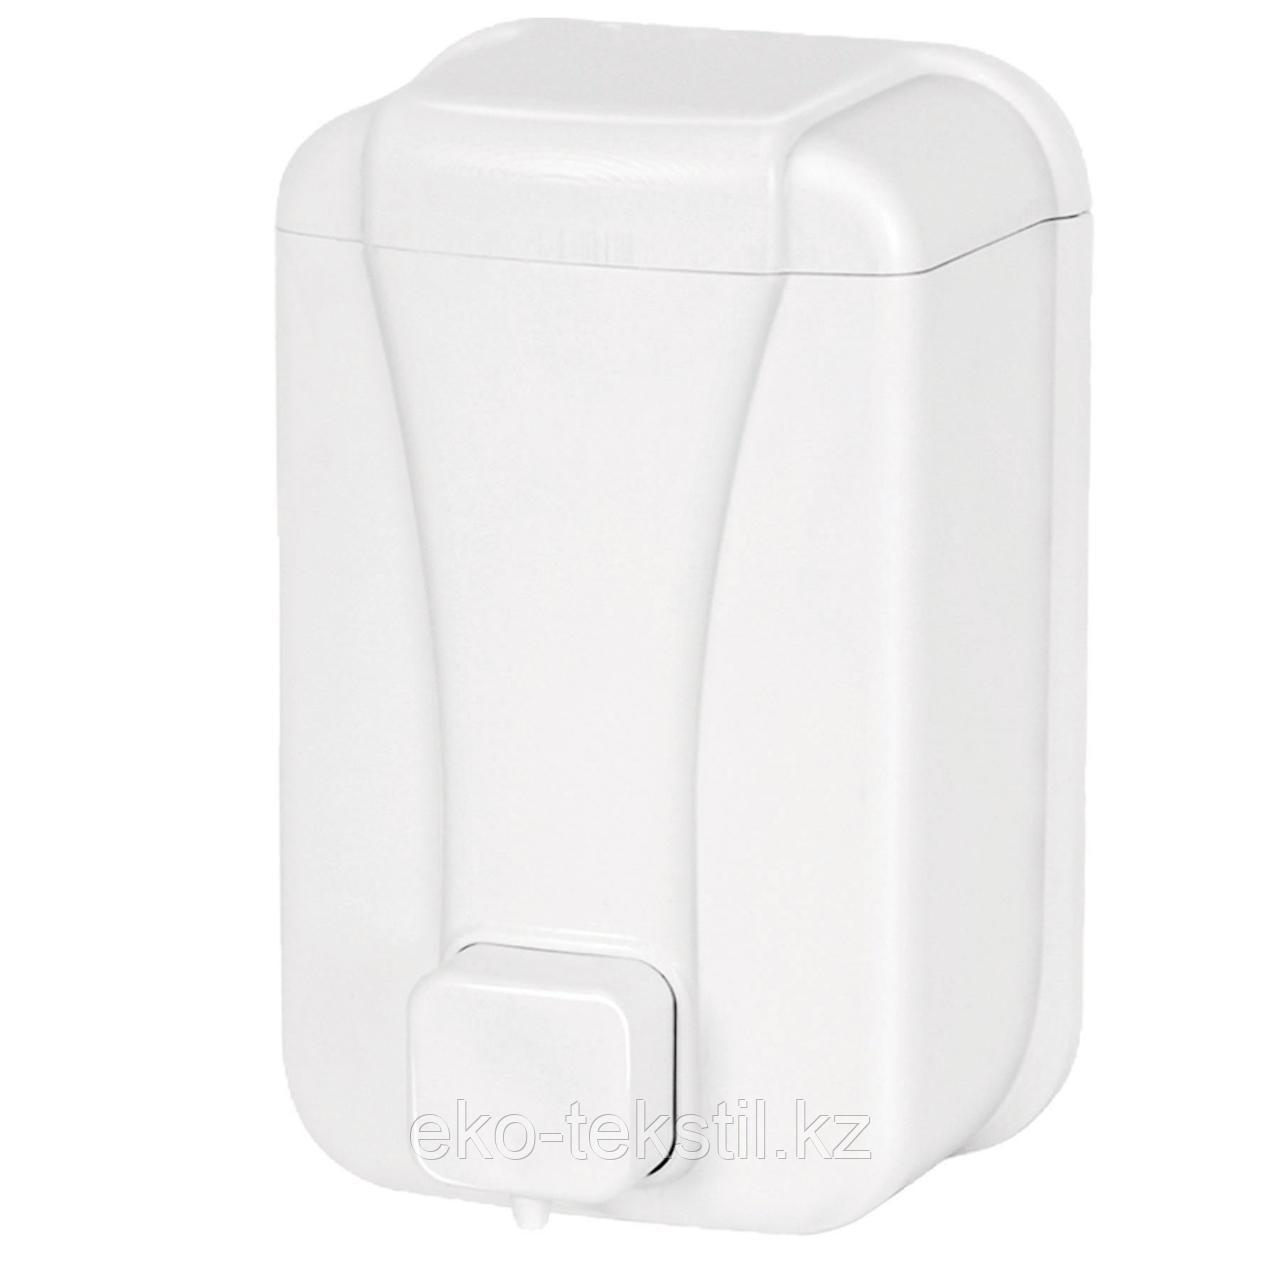 Диспенсер для пенки для мытья рук, 500 мл. Стандарт